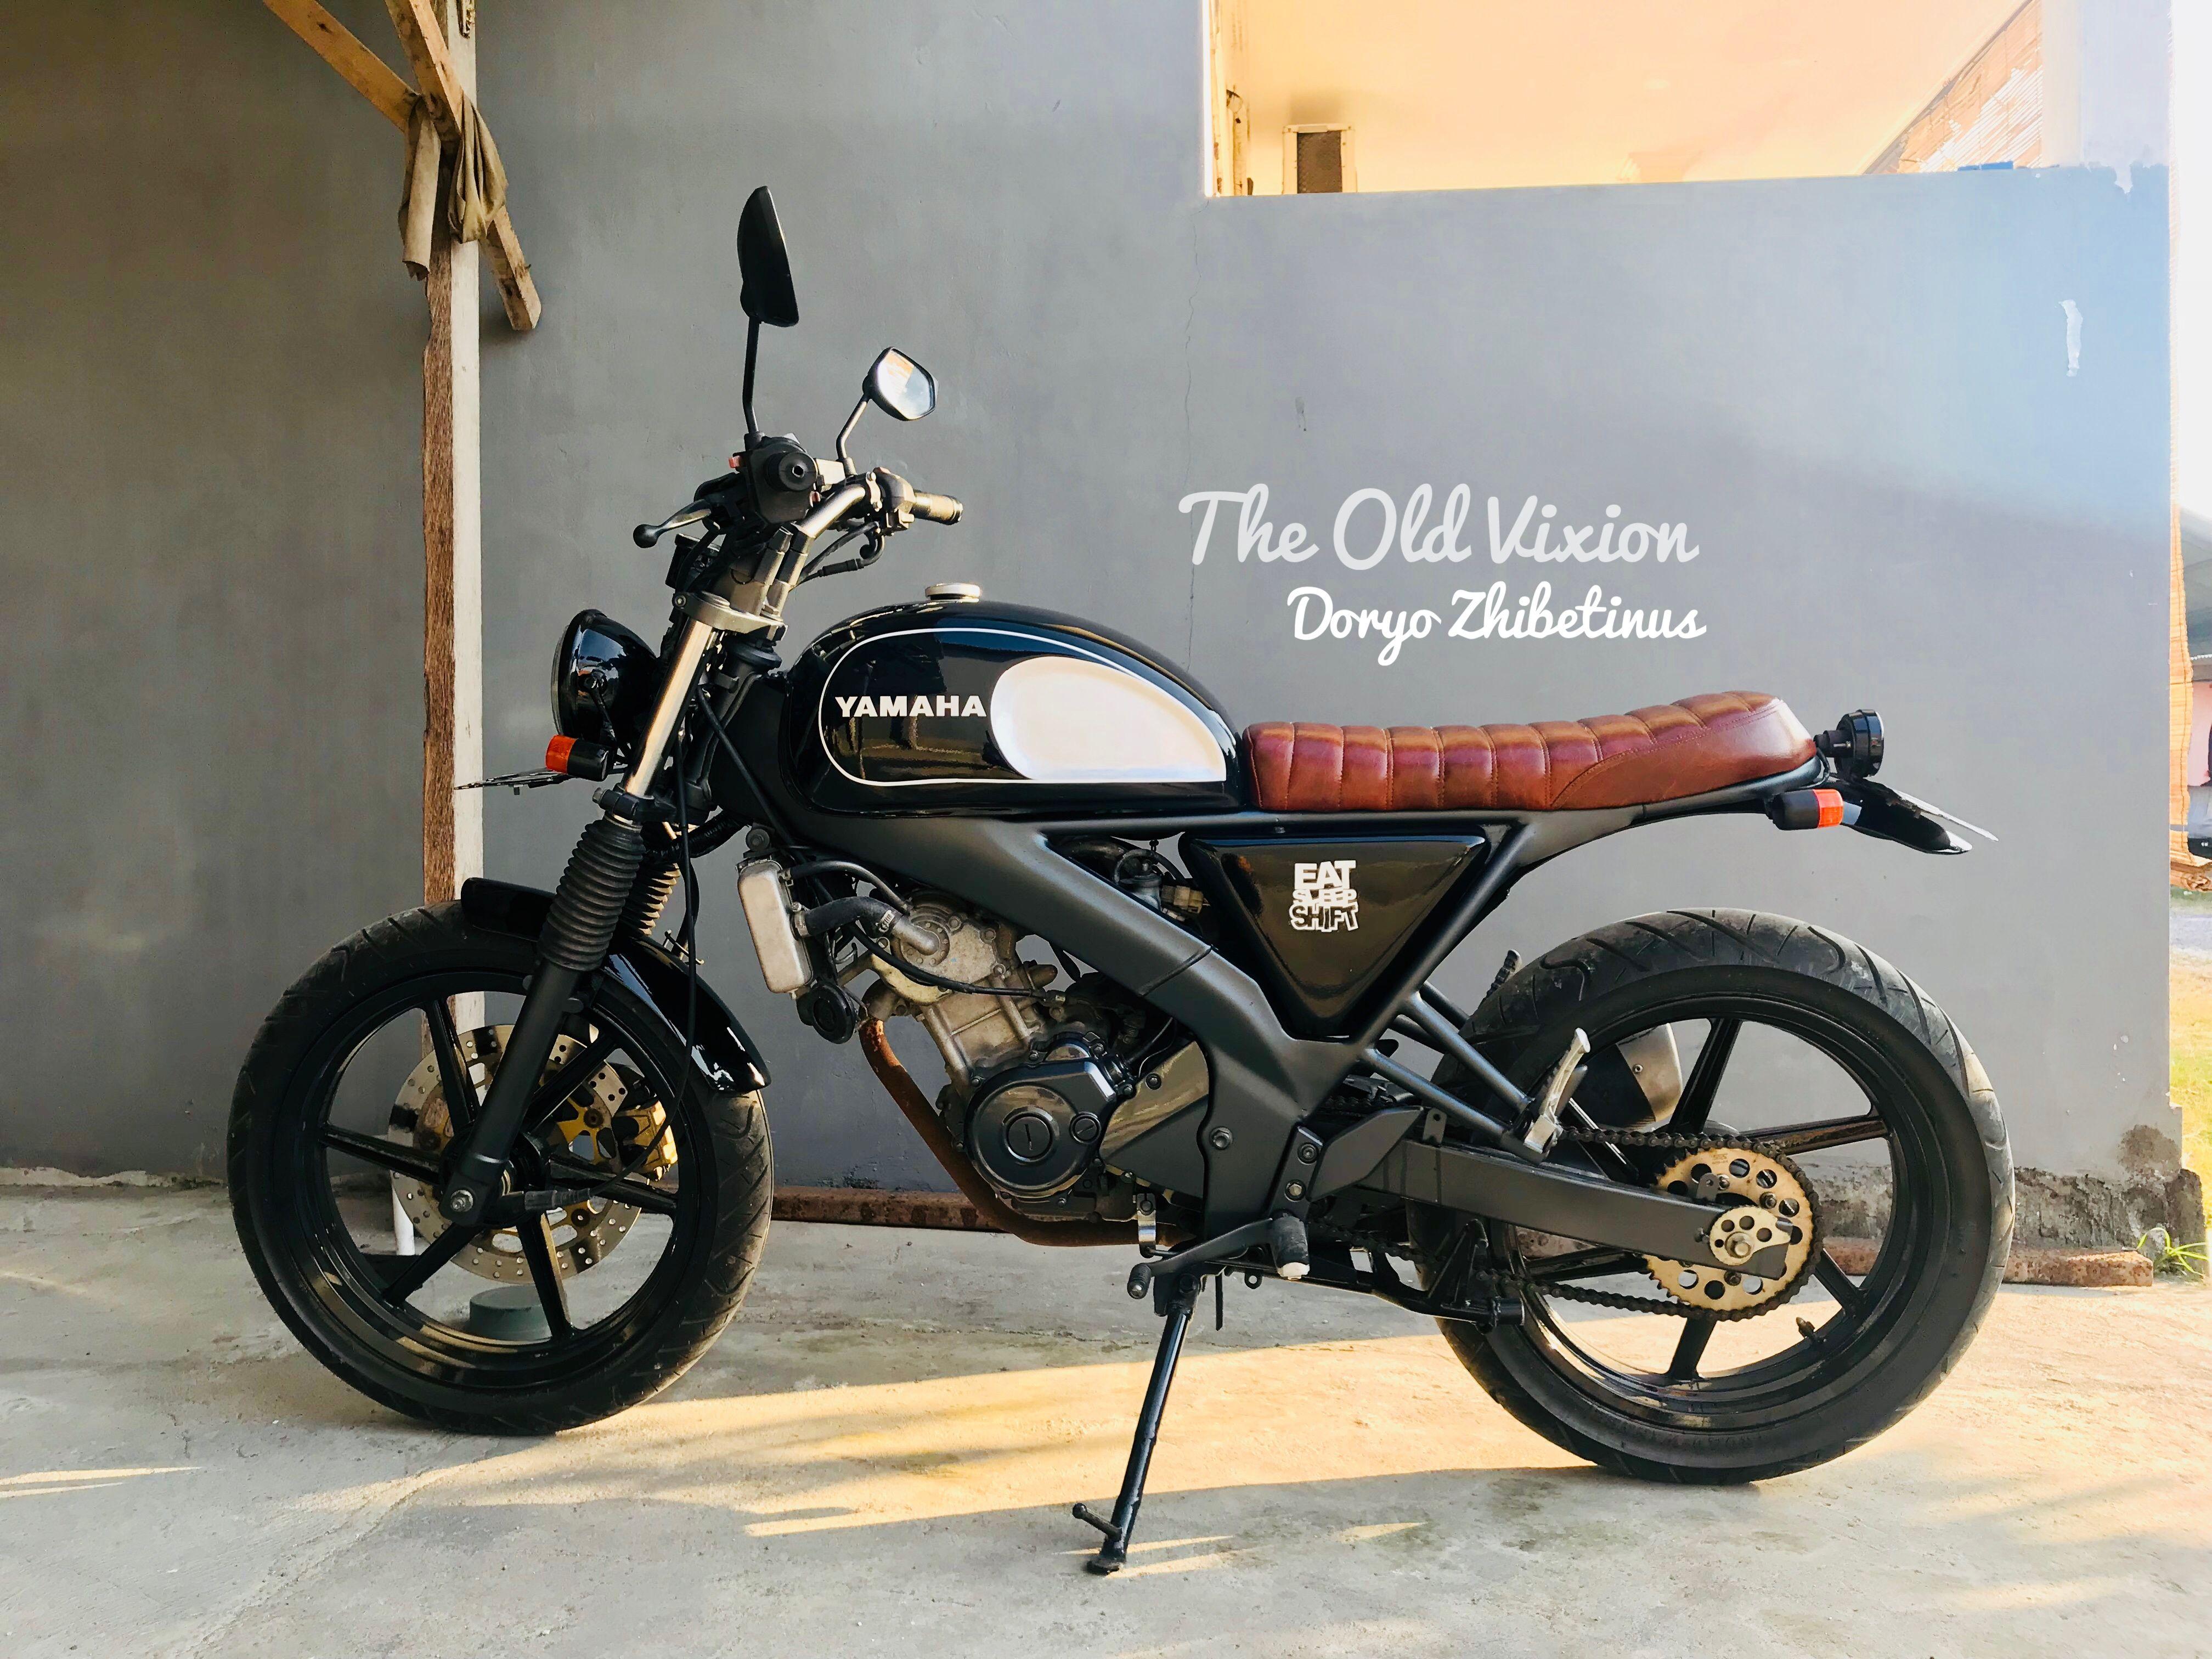 Yamaha Vixion 150 Scrambler Japstyle Motor Modifikasi Motor Mobil